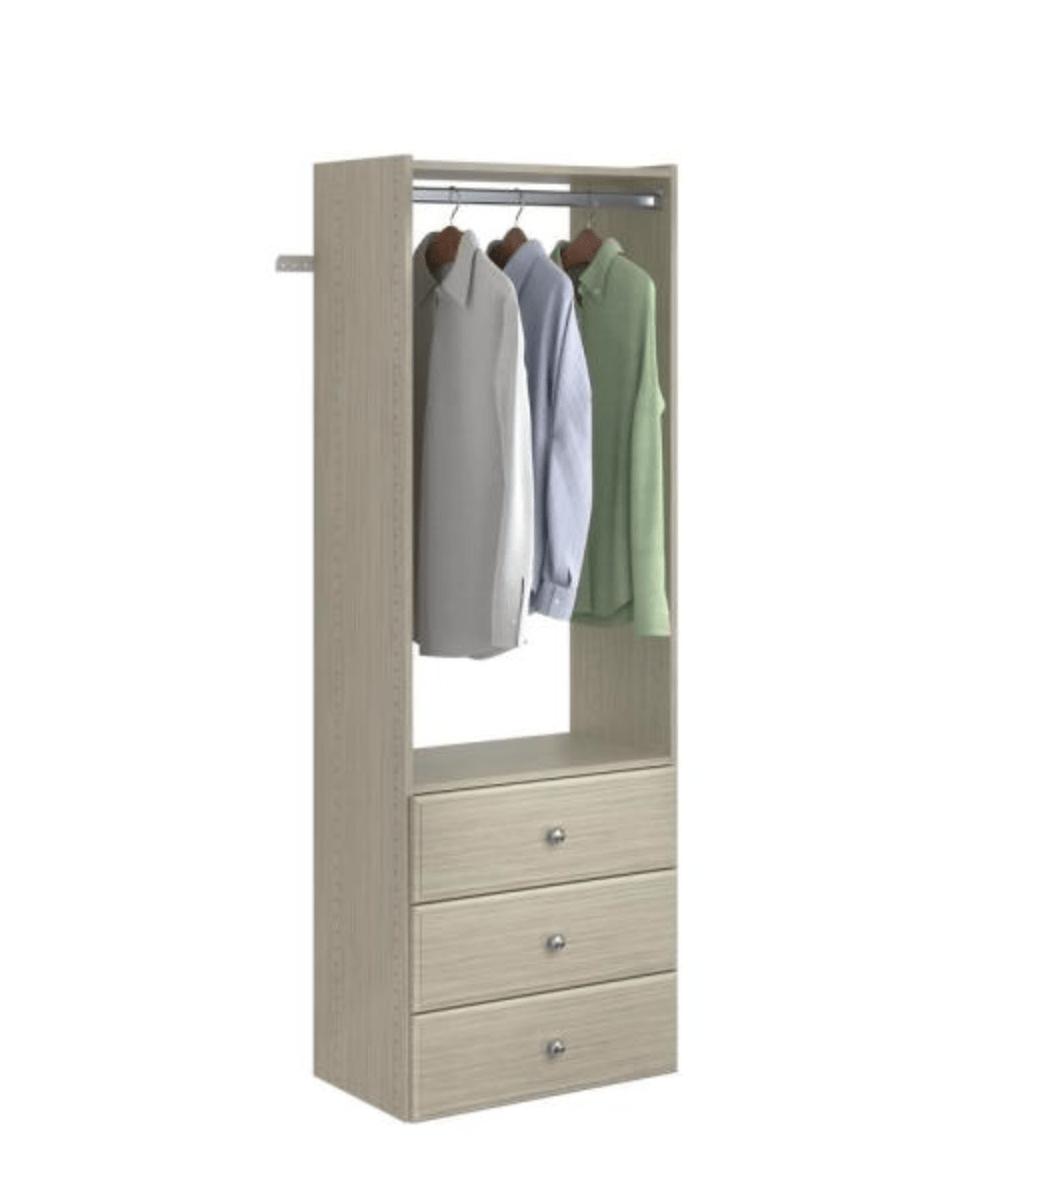 Wood Closet Tower